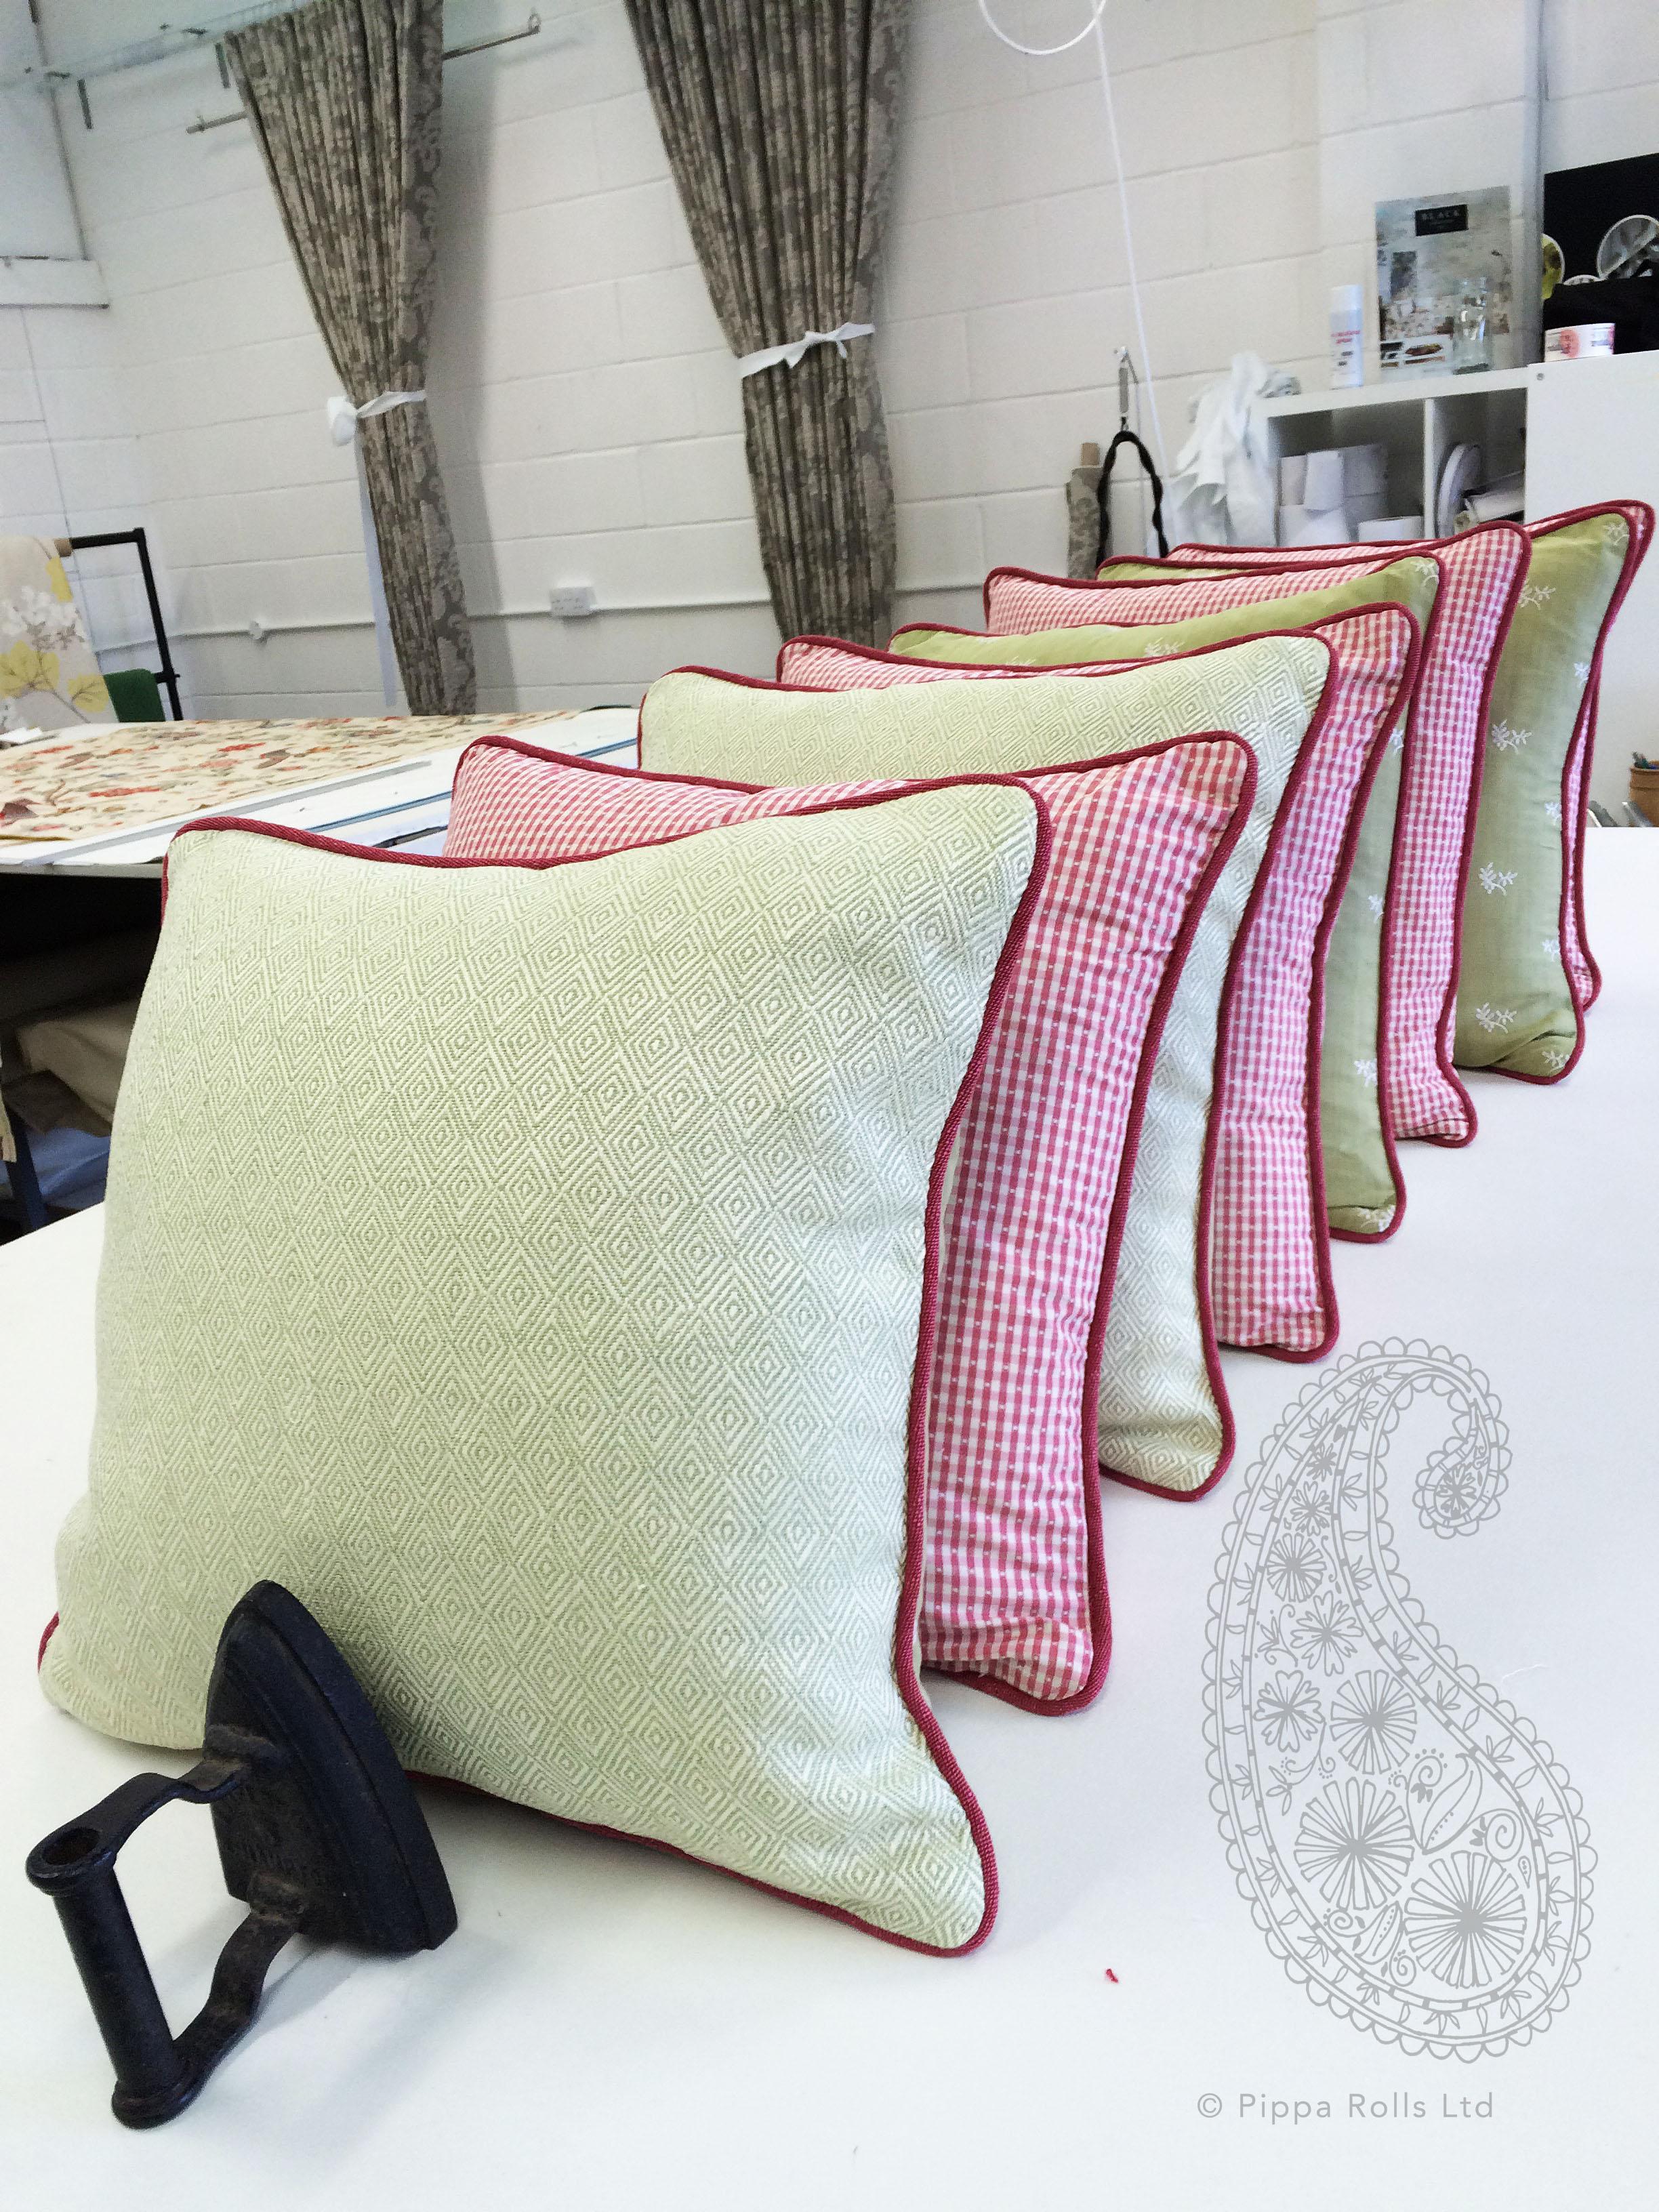 Macaroon cushions Pippa Rolls Limited (1) jpeg.jpg